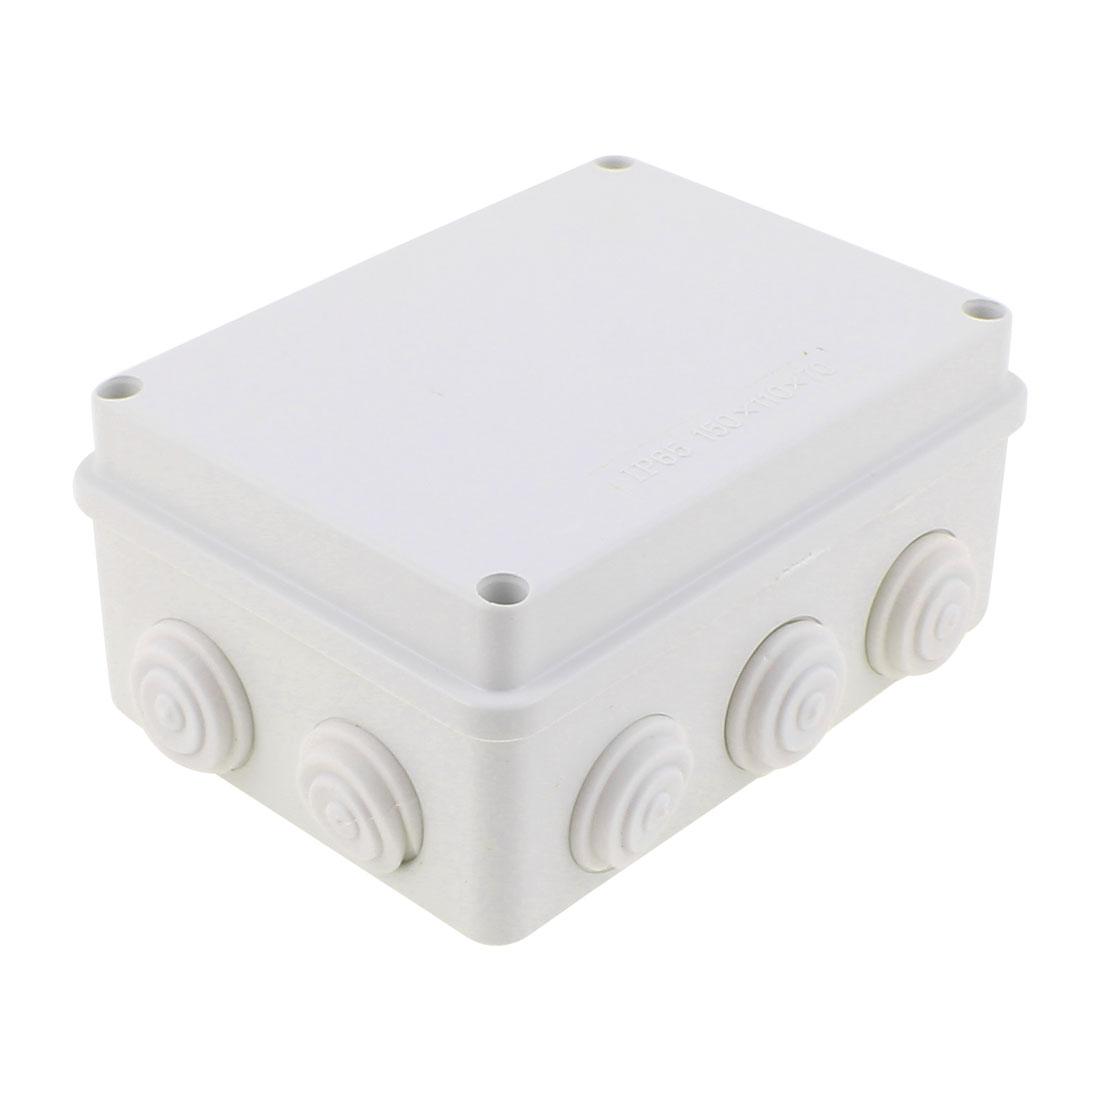 150 x 110 x 70mm Dustproof IP66 Junction Box DIY Sealed Terminal Box Enclosure